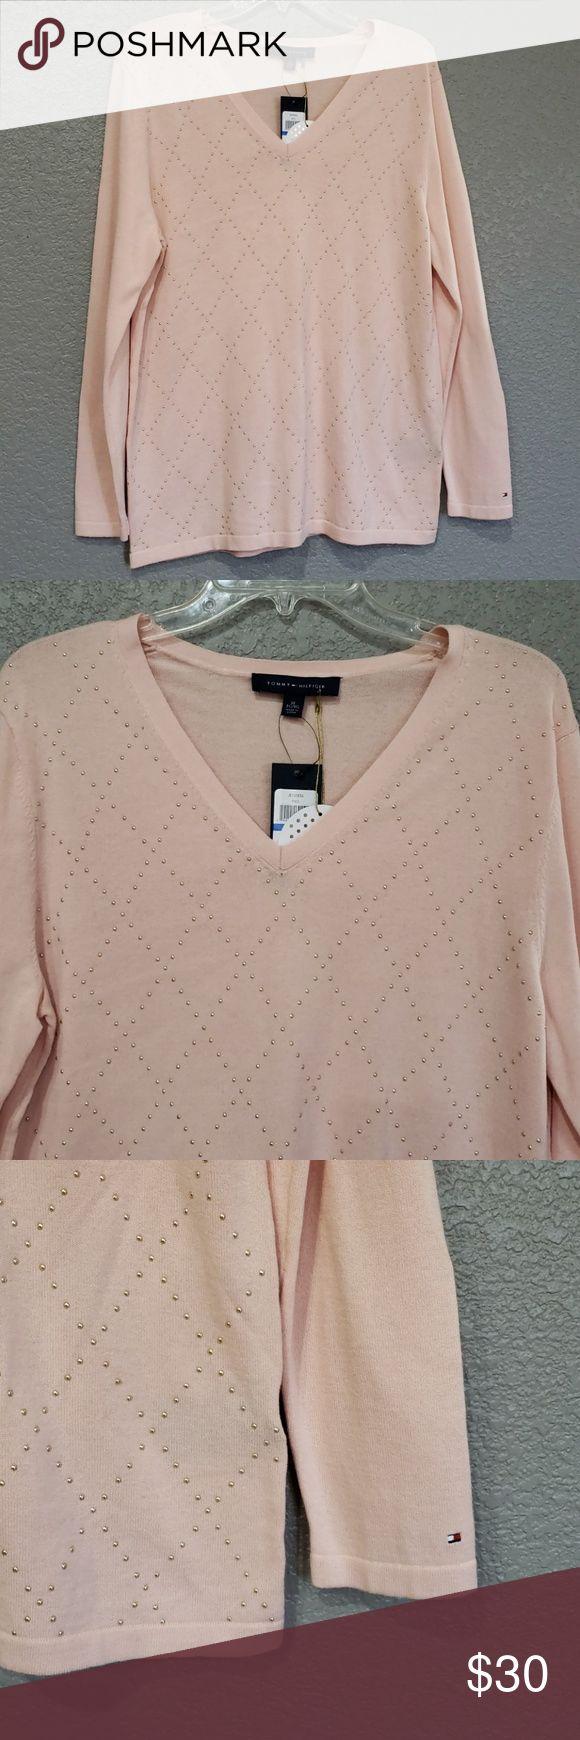 Tommy Hilfiger Cotton knit seater/blouse 12019 100